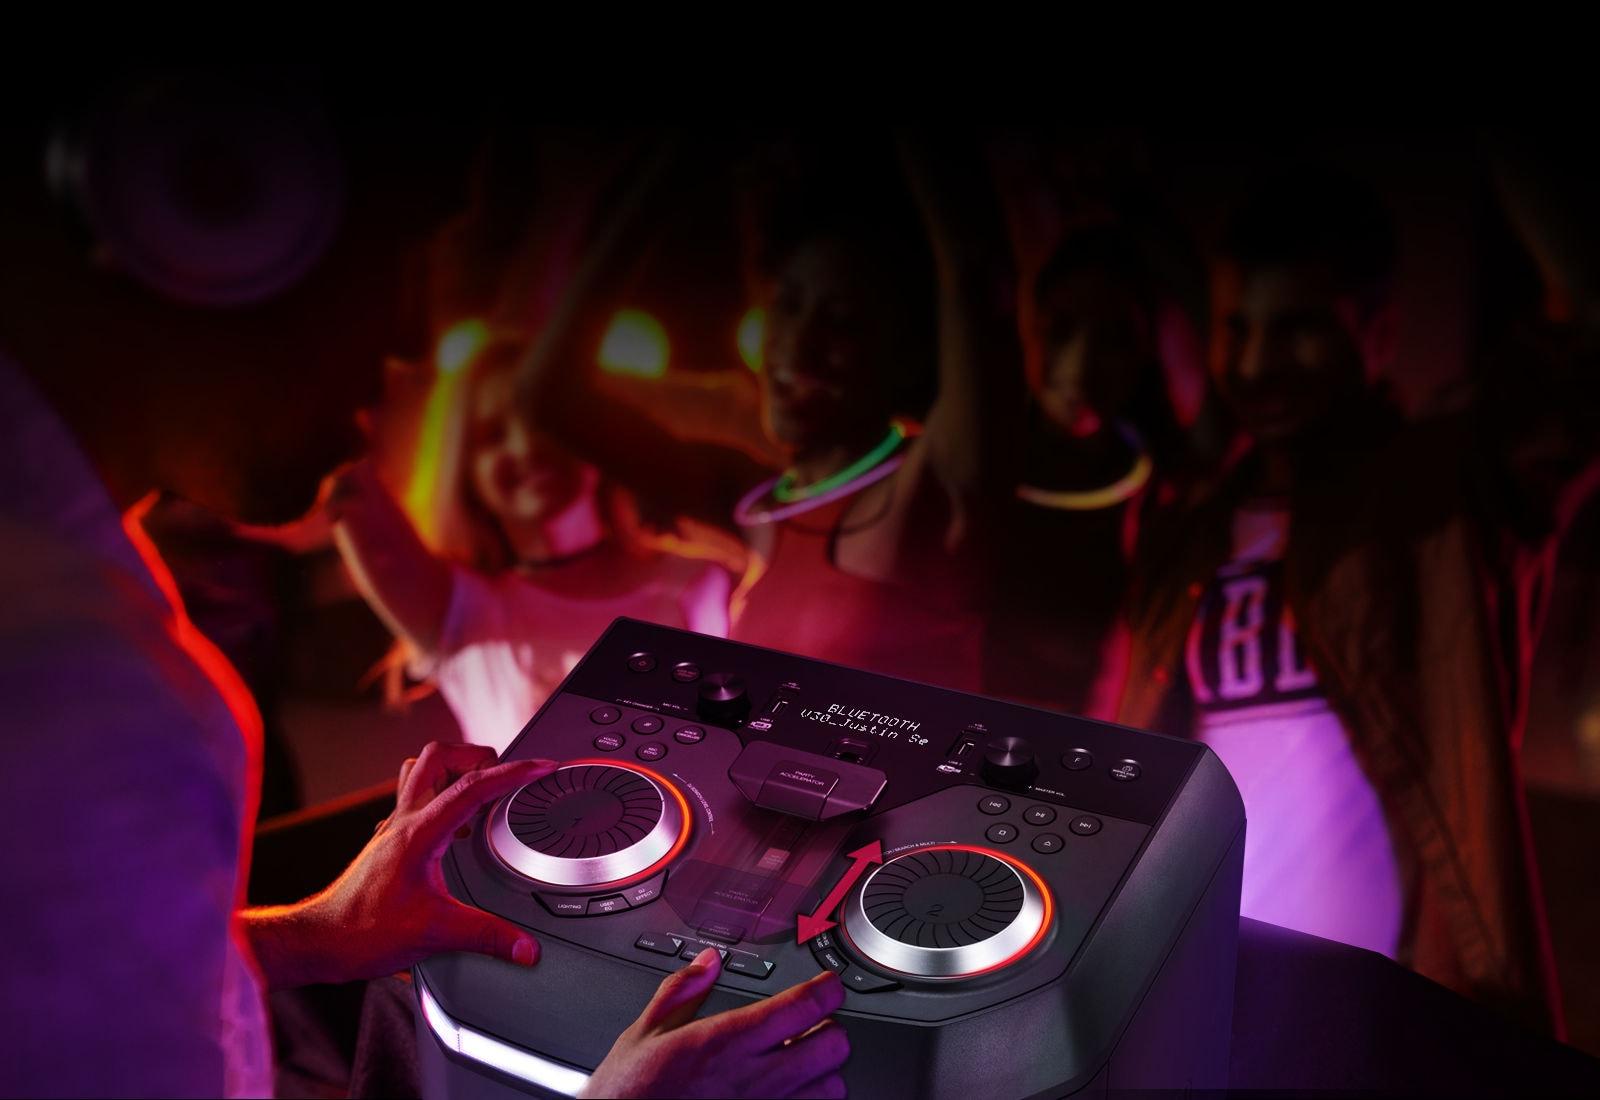 Accelerate_Your_Party_Desktop